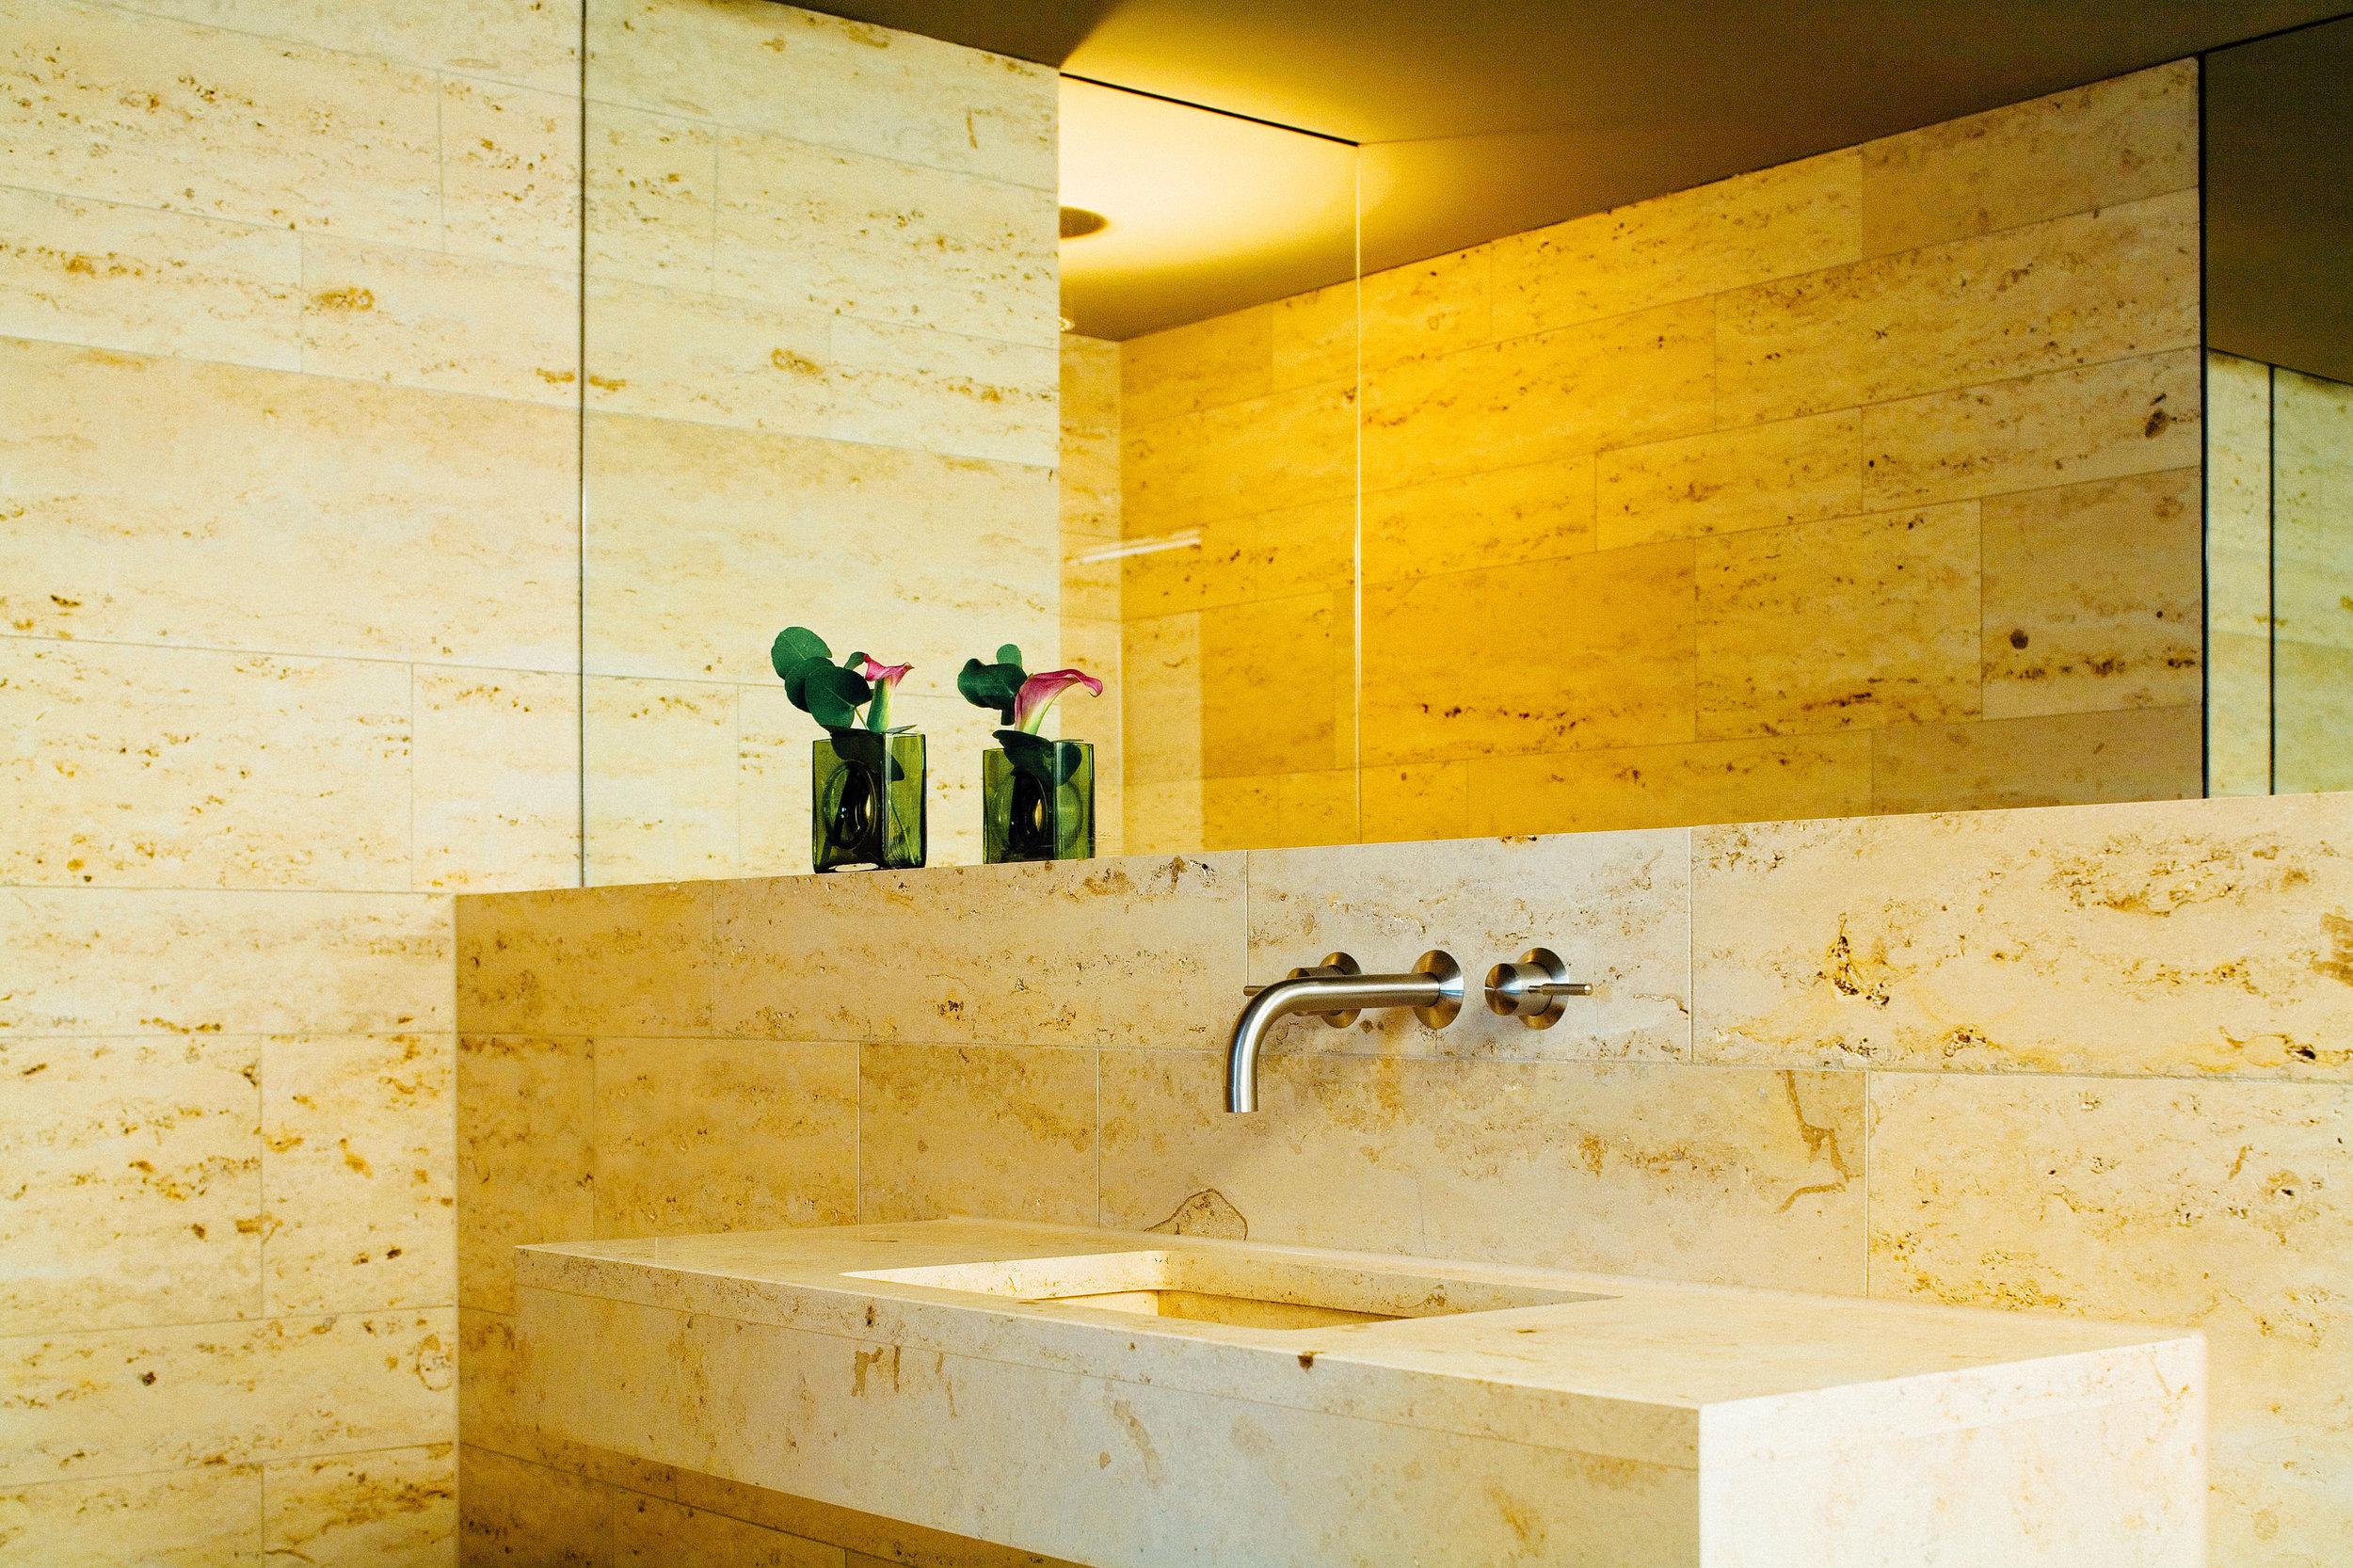 Cortiina x Juliah Haupt SUg Sean Munich Hotel-5.jpg